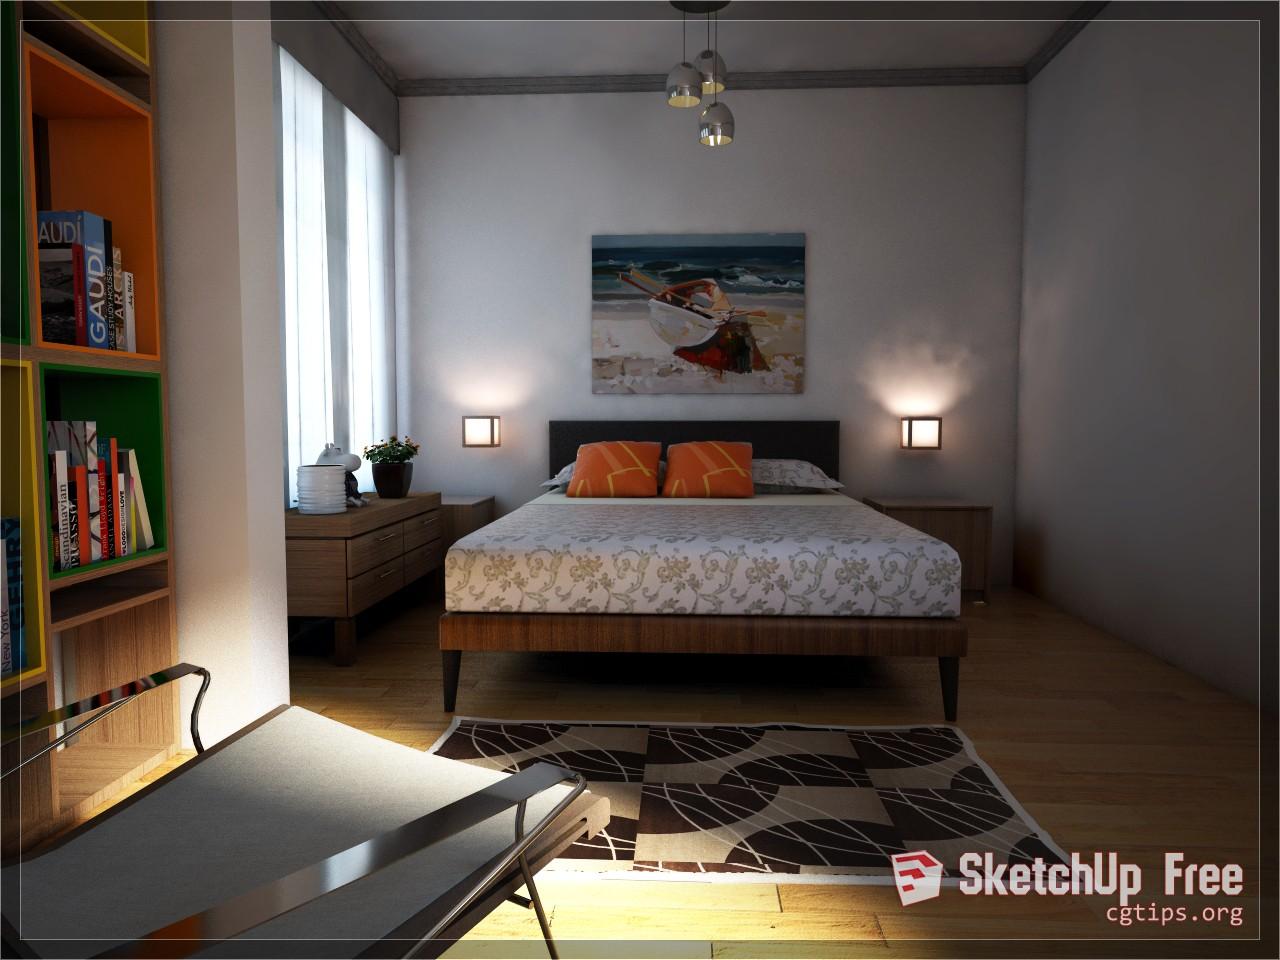 Exterior: 1787 Interior Bedroom Scene Sketchup Model Free Download